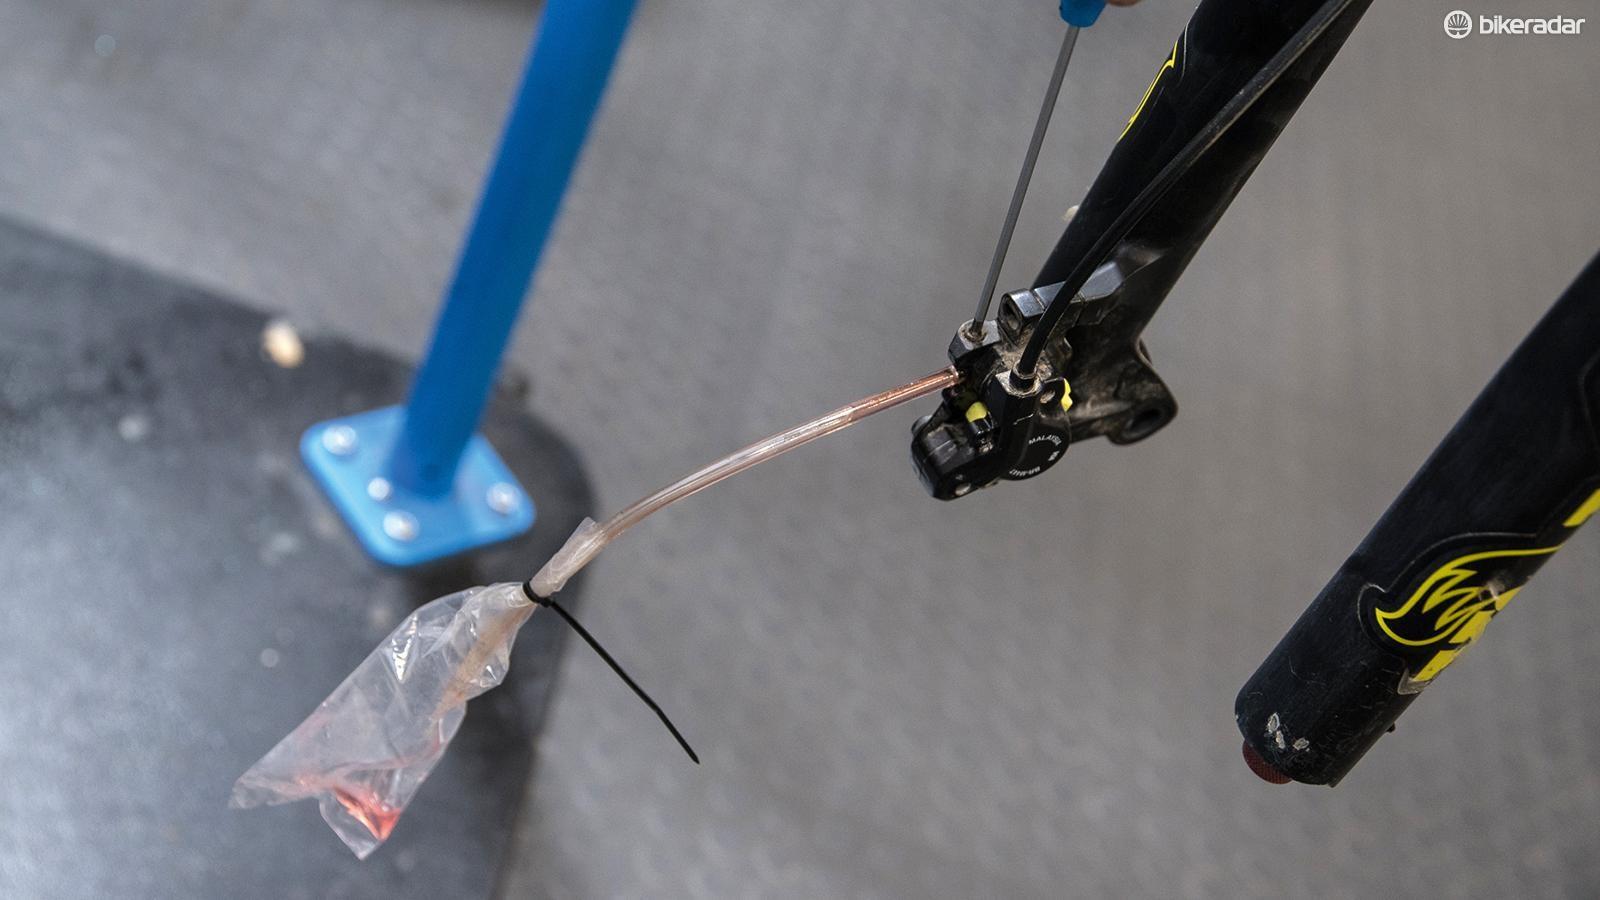 tips-for-bleeding-shimano-brake-05-1519948261063-qmnphebv9zal-1535015236458-1lzs1q0r1ywsb-7194767